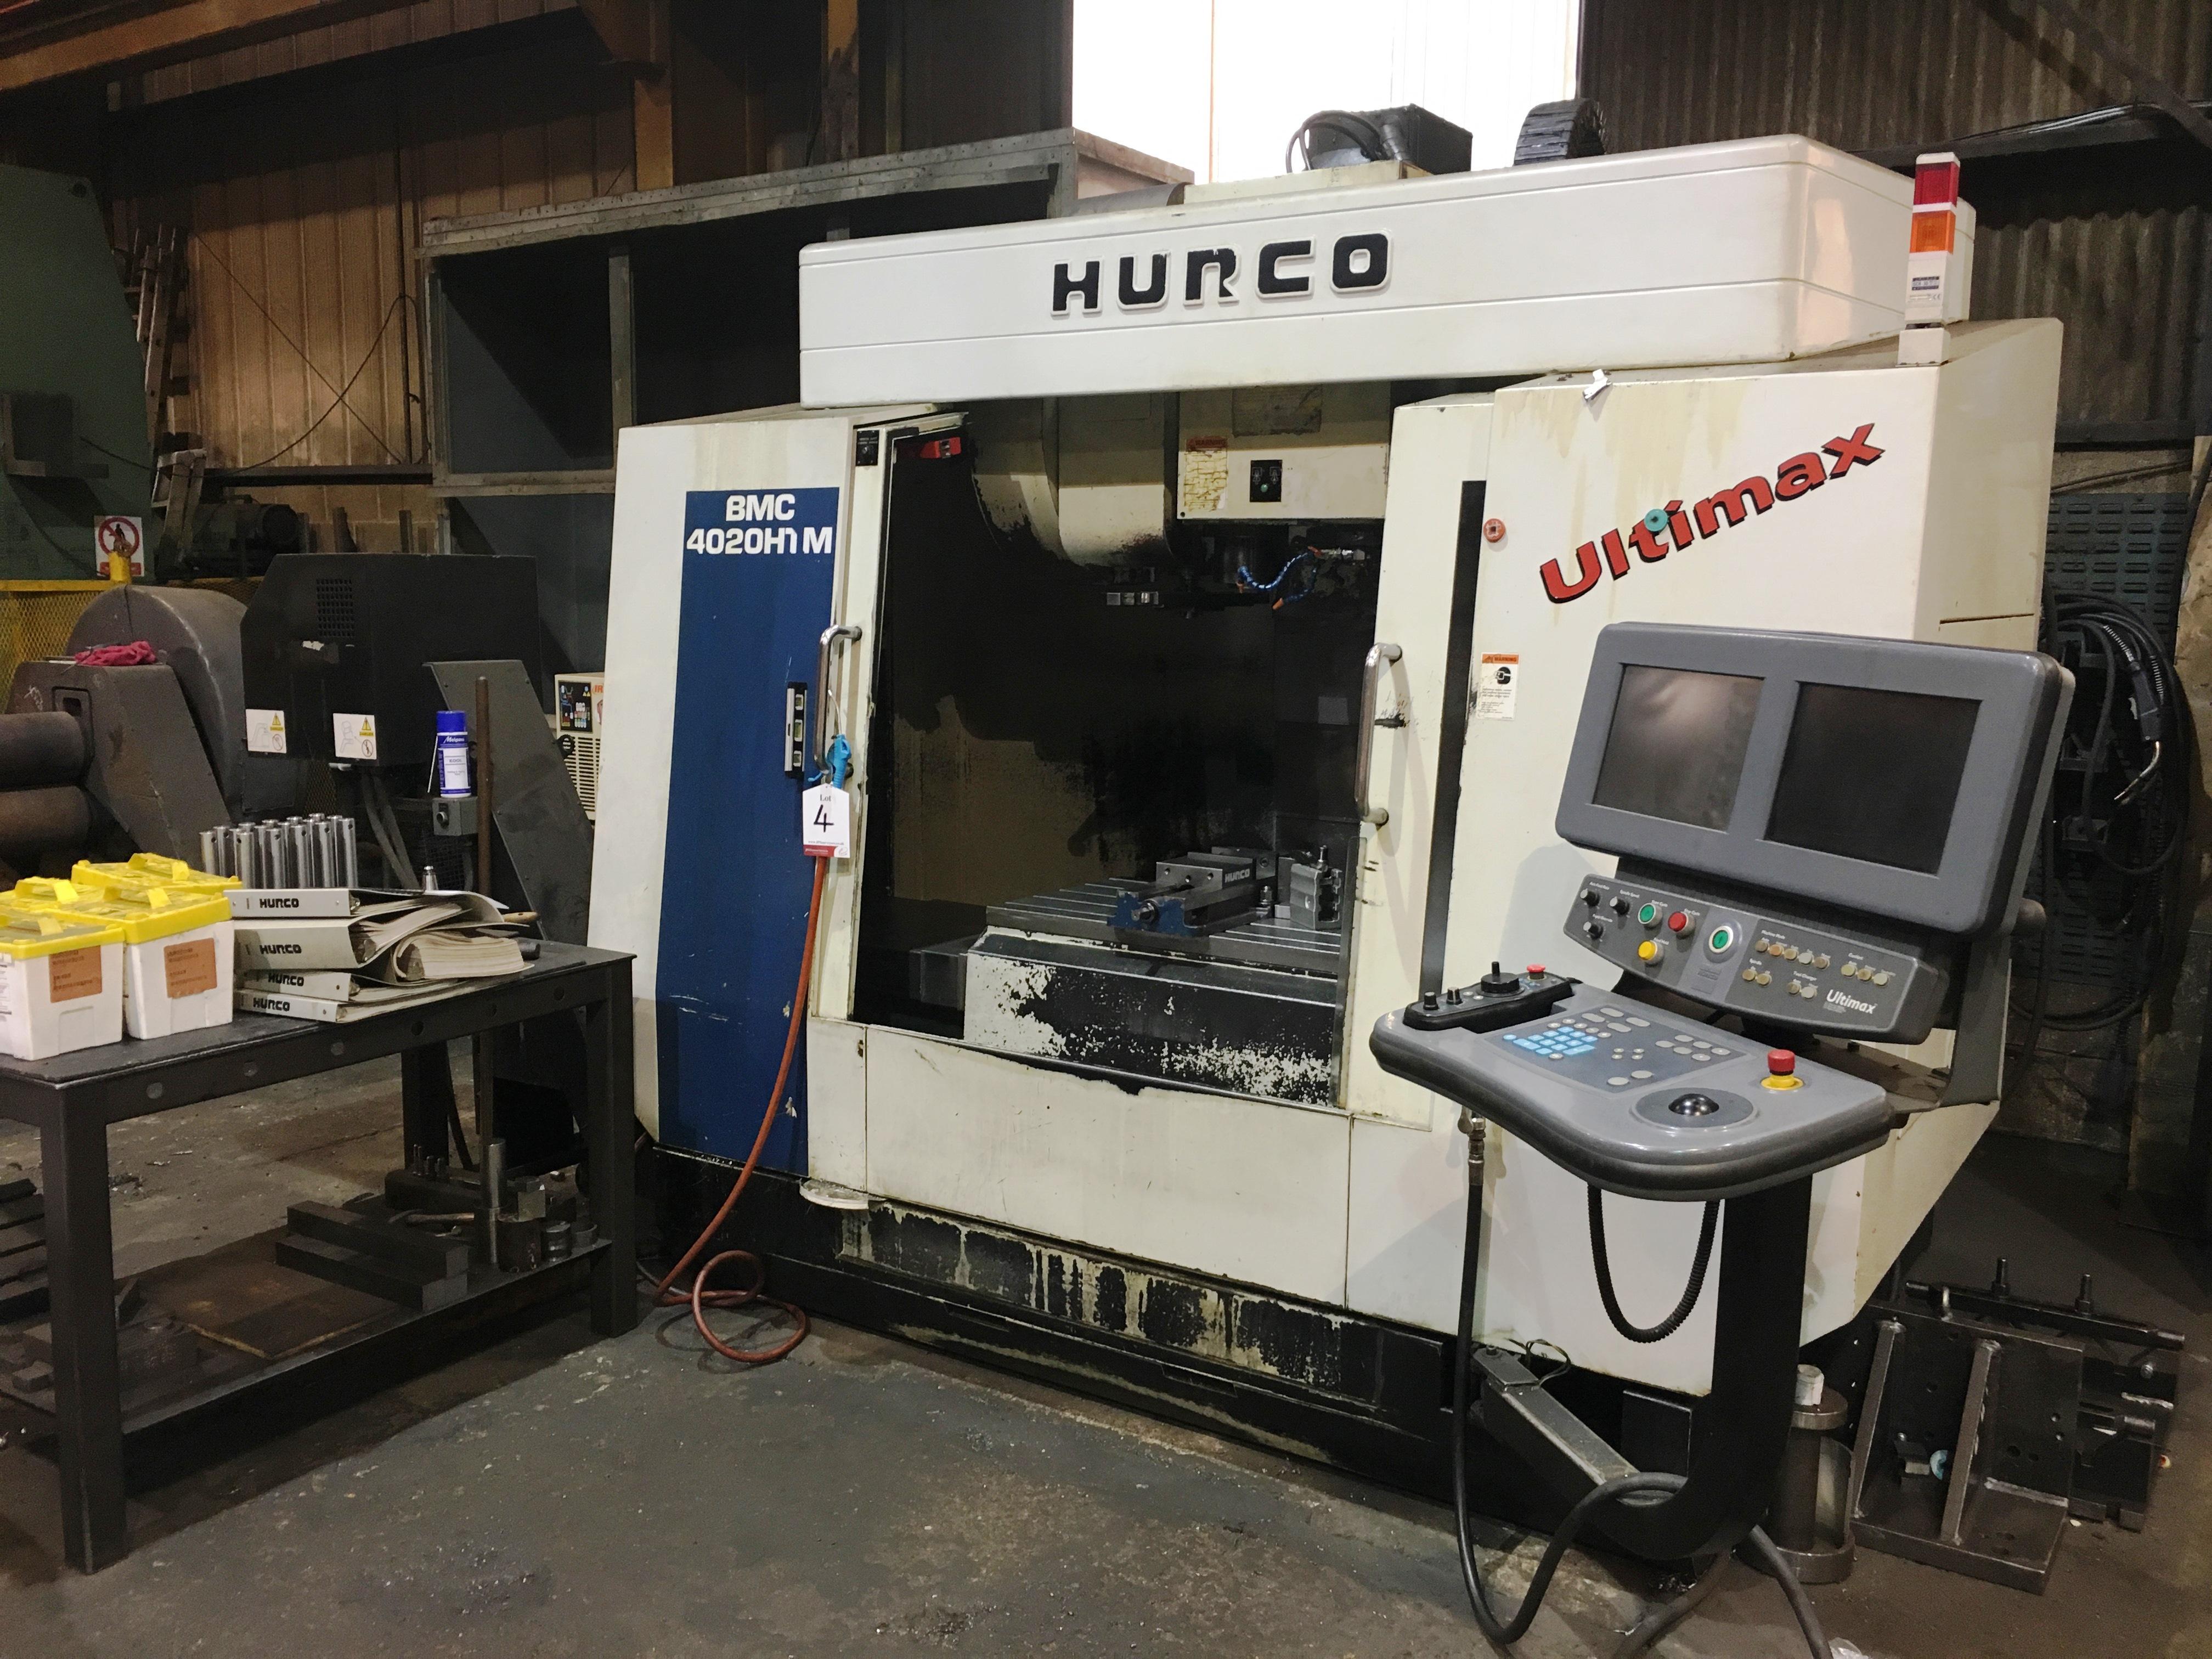 Hurco BMC 4020 HT/M CNC Vertical Machining Centre | YOM: 2000